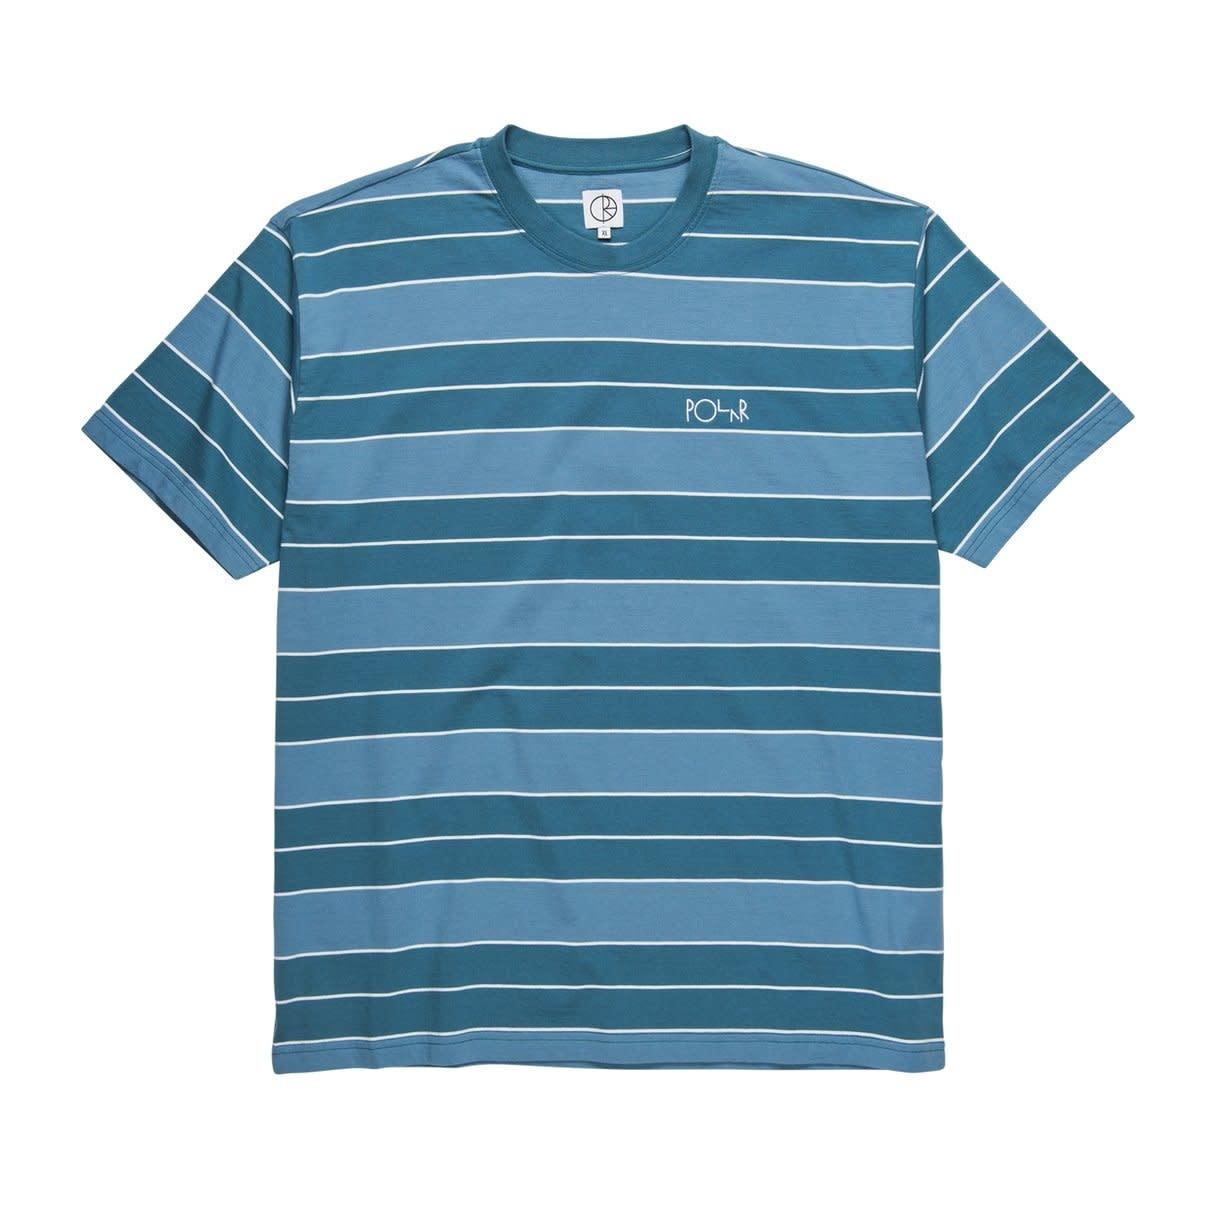 Polar Skate Co. Dane Tee Grey Blue